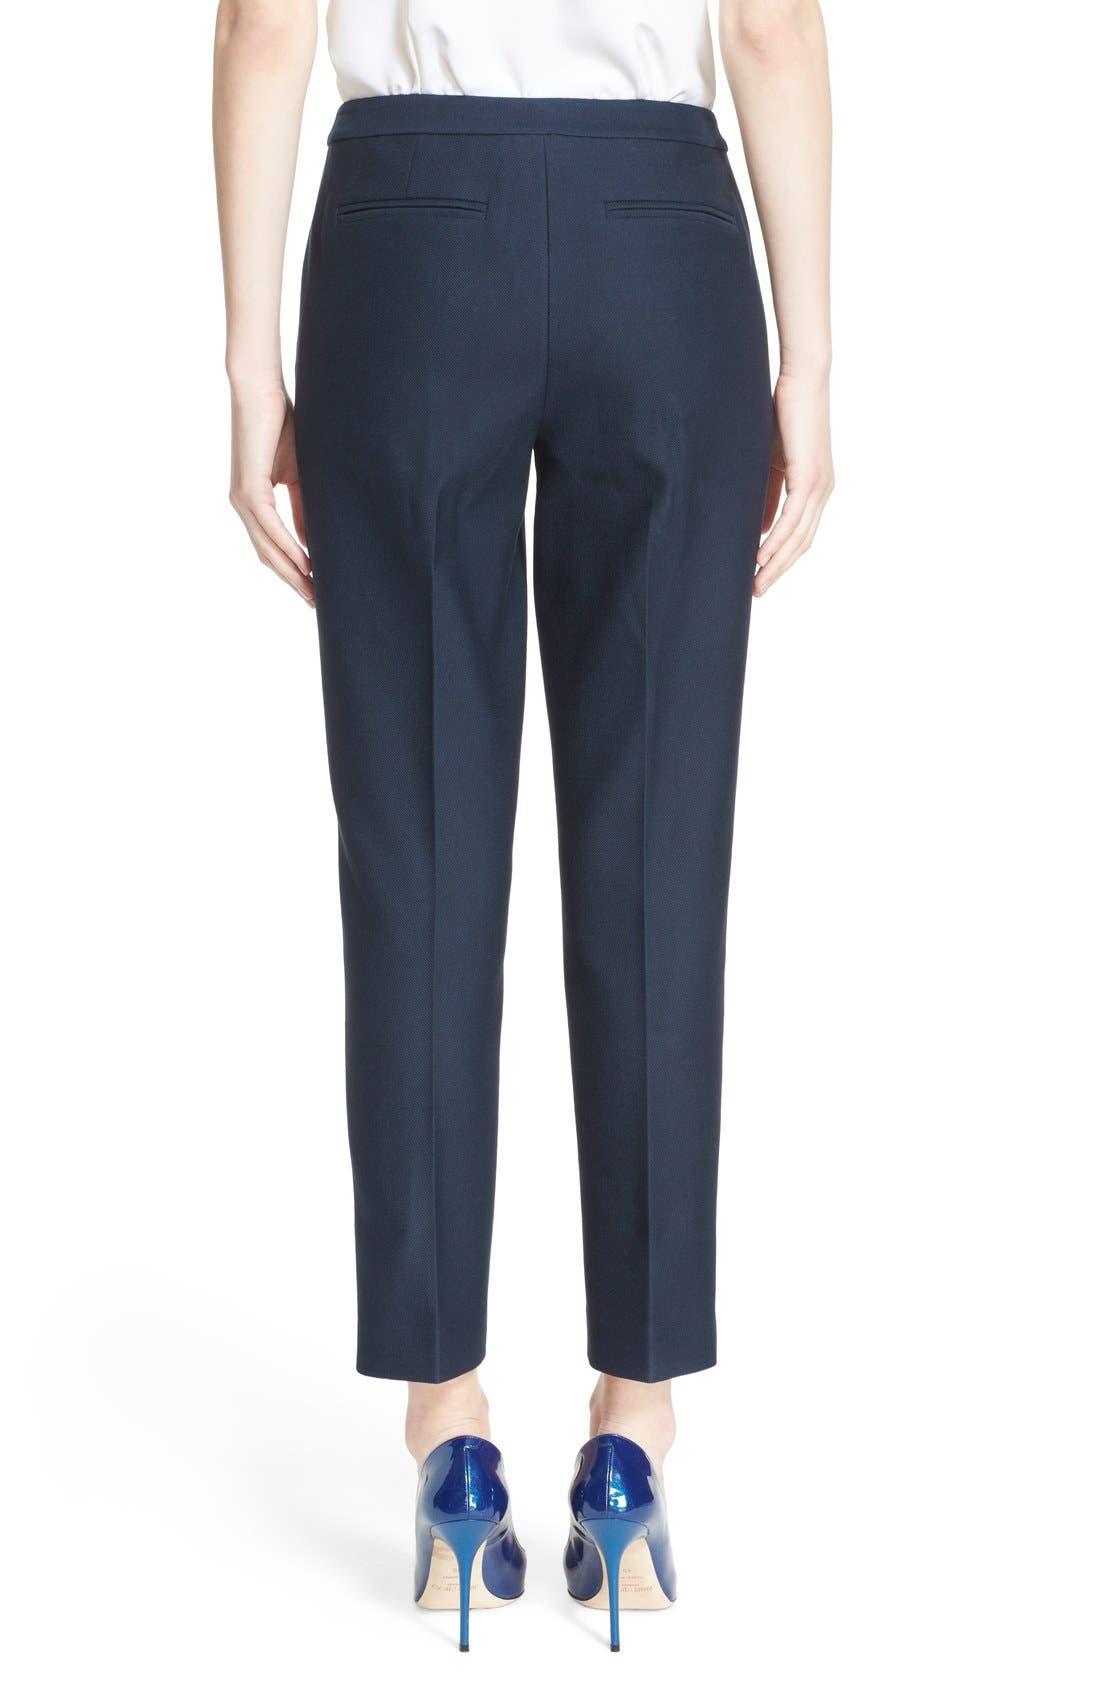 Alternate Image 2  - Nordstrom Signature and Caroline Issa 'Raindrop' Slim Cotton Ankle Pants